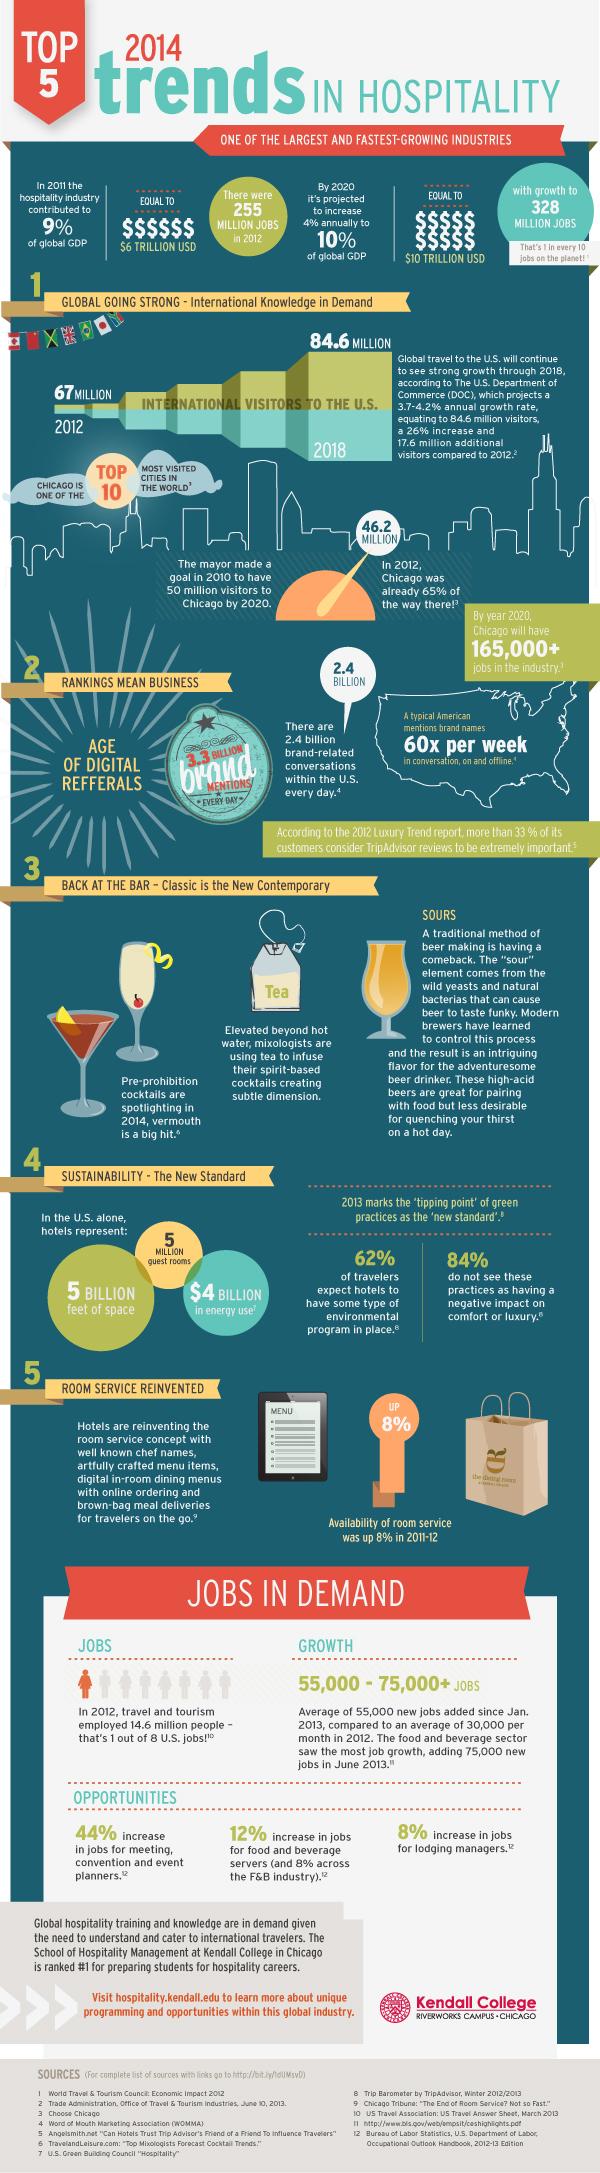 17 Hospitality Industry Employment Statistics